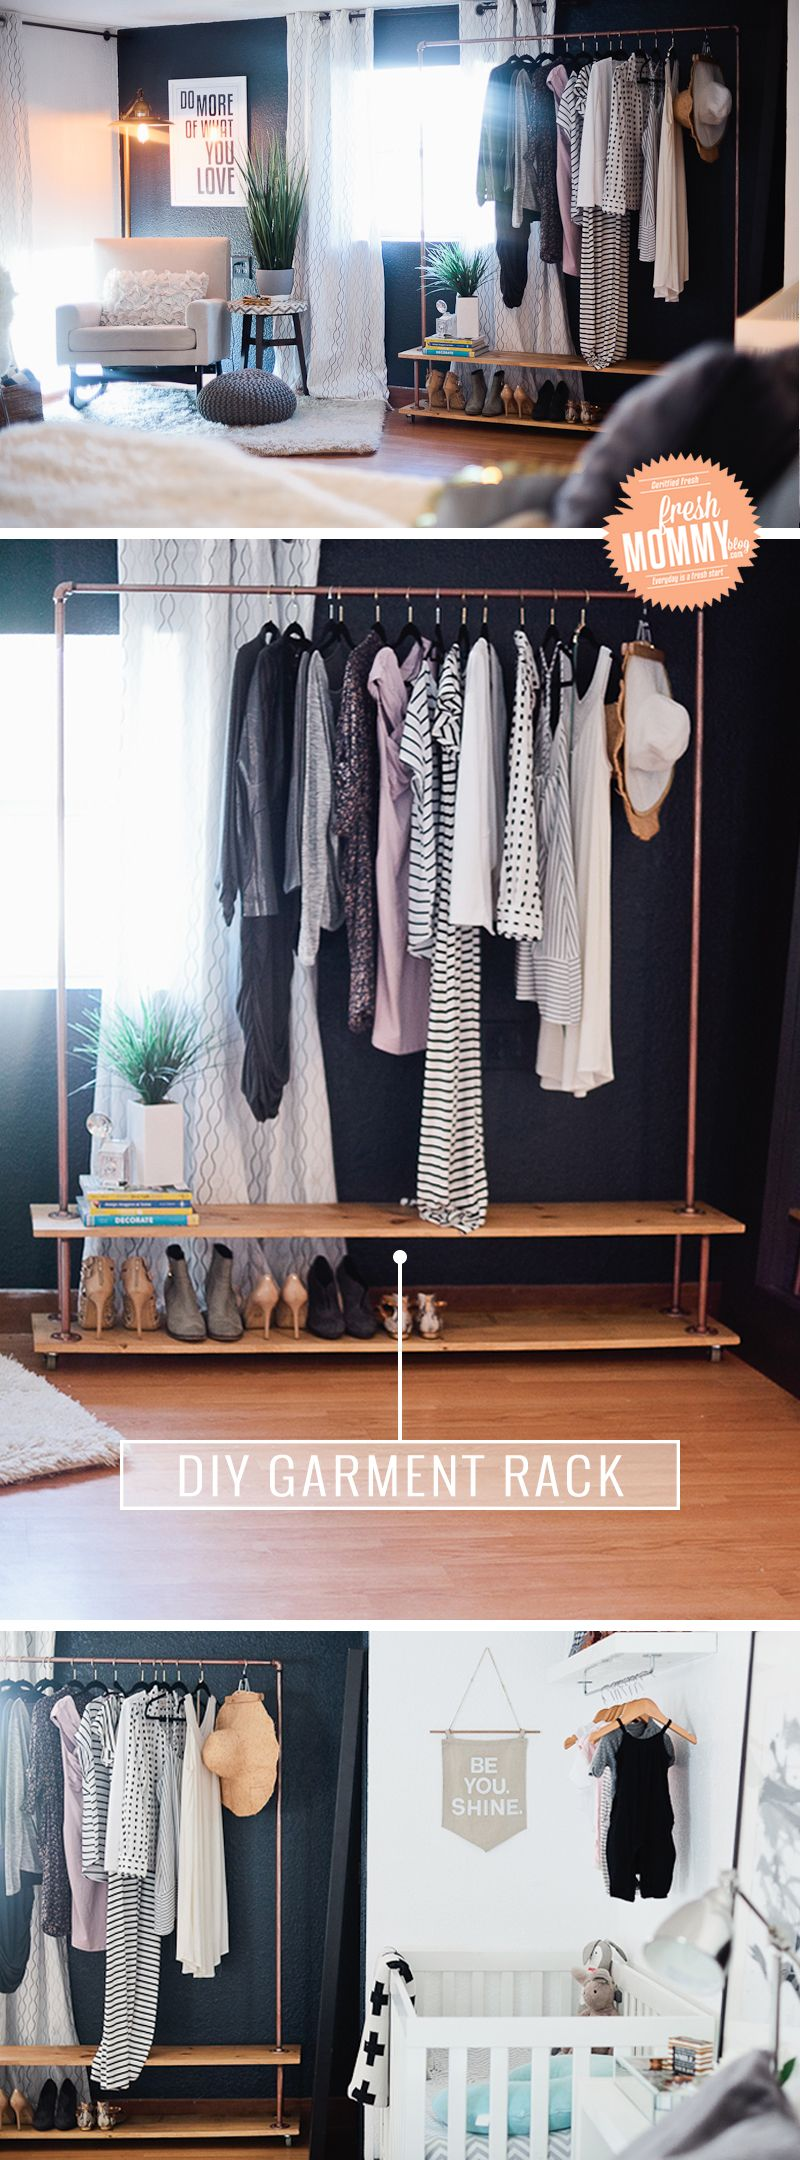 Rolling Diy Garment Rack For Your Wardrobe Fresh Mommy Blog